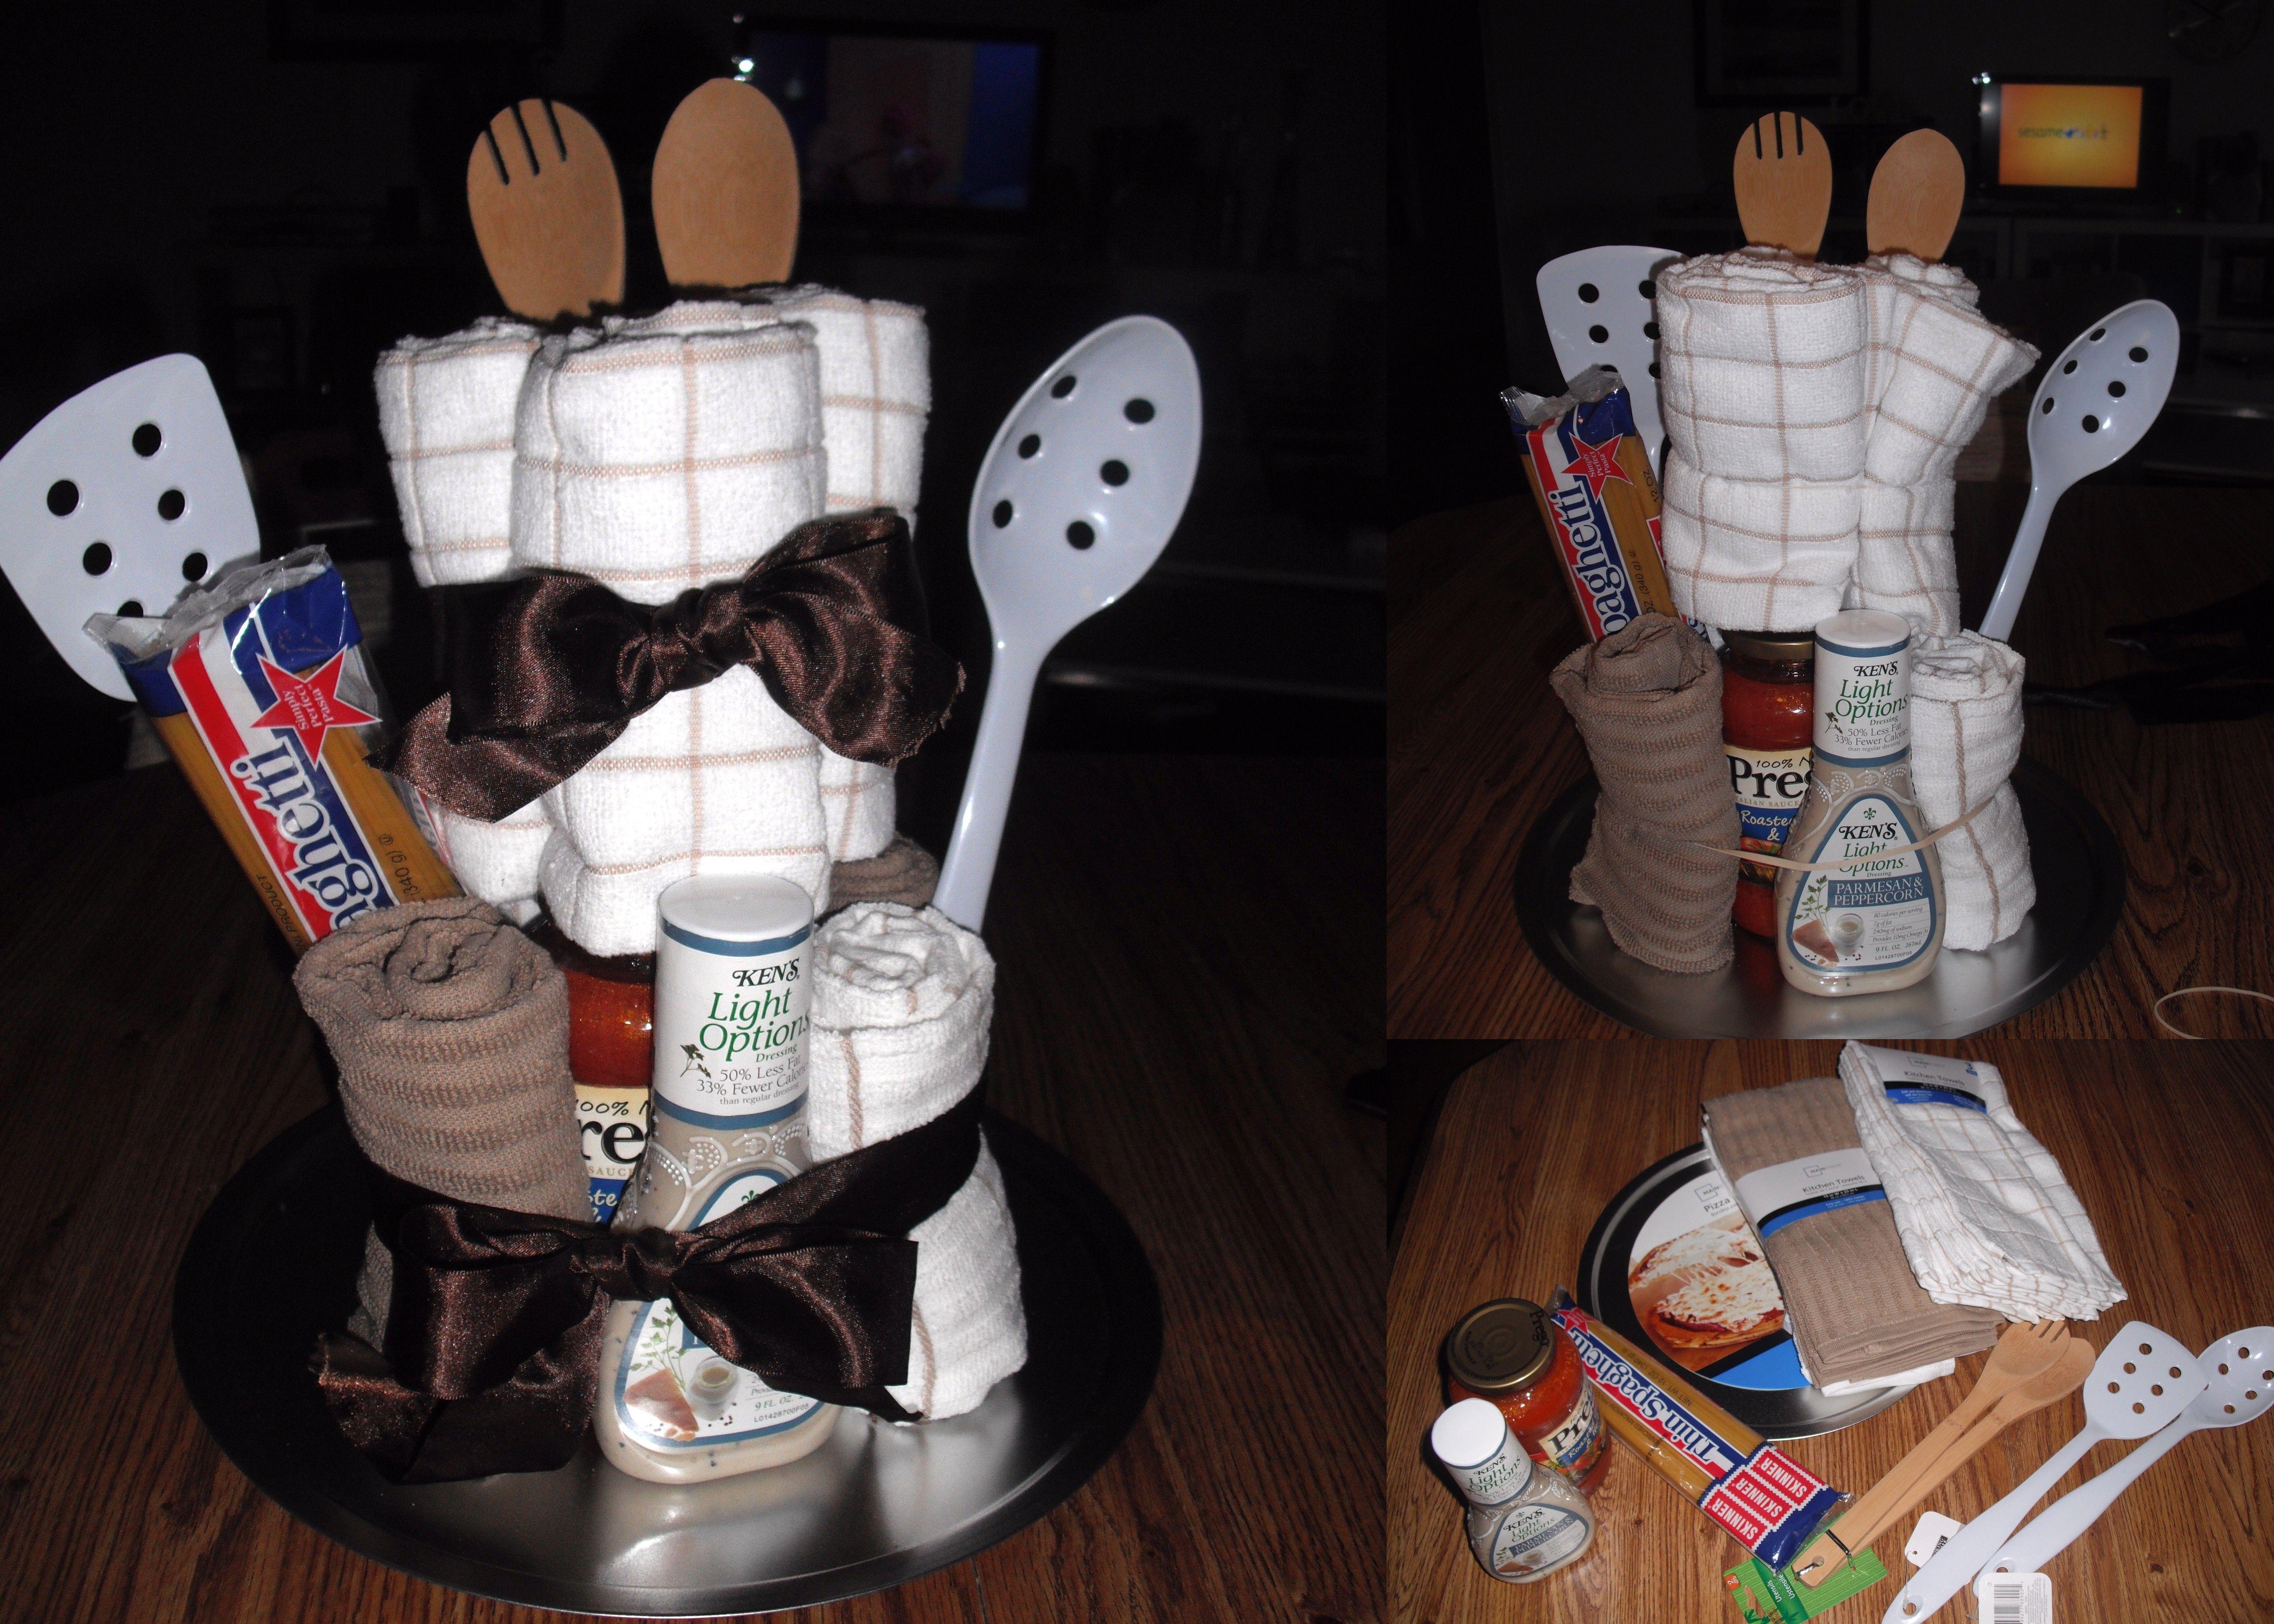 Bridal Shower gift invite asked to bring a favorite jar